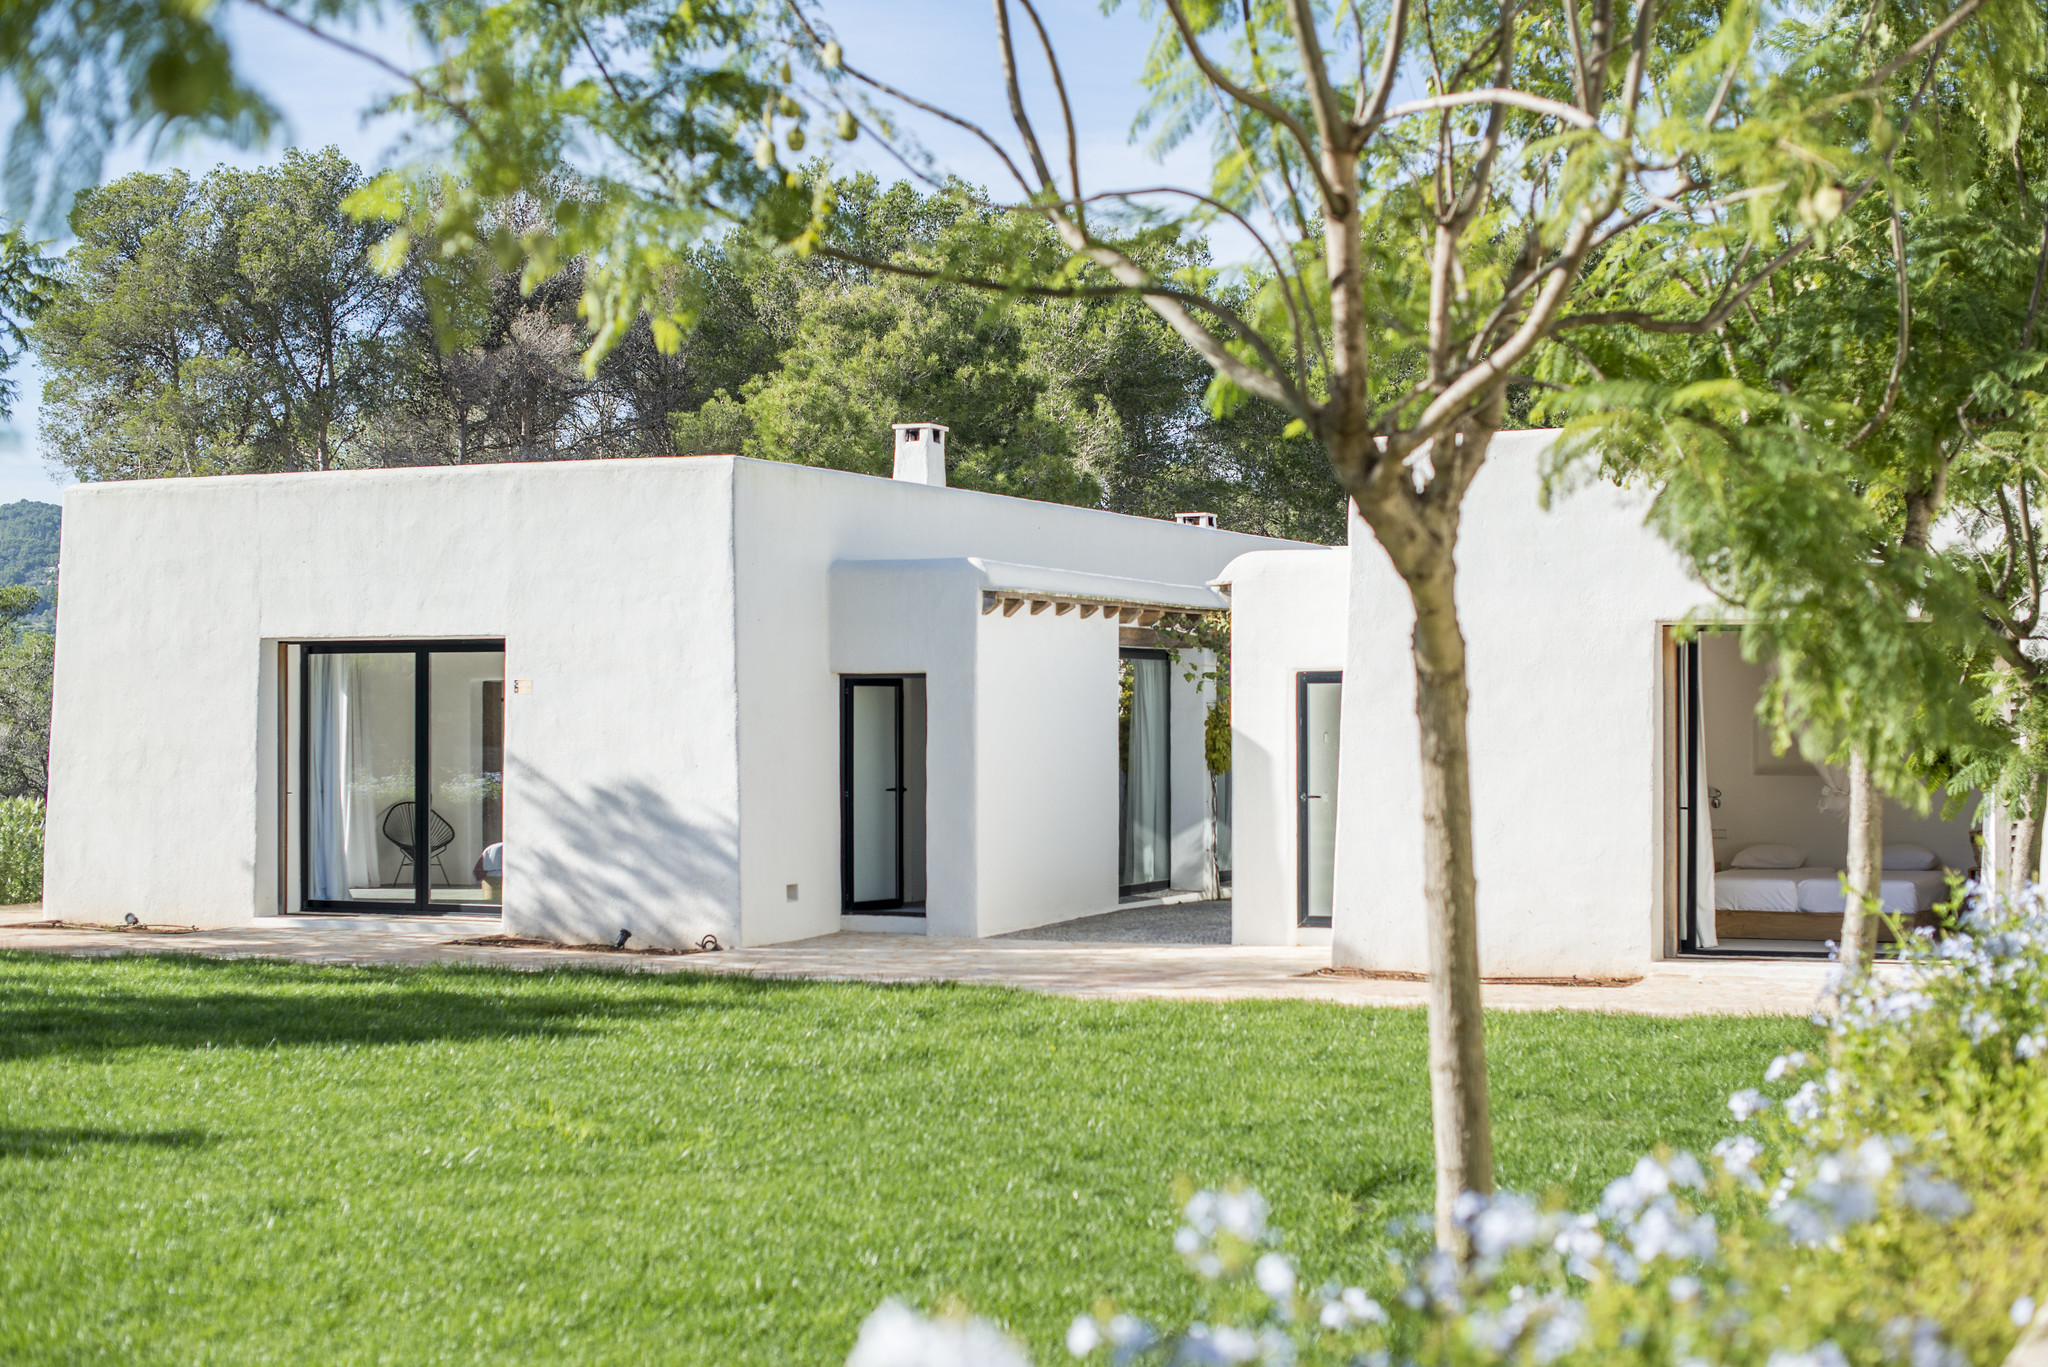 https://www.white-ibiza.com/wp-content/uploads/2020/05/white-ibiza-villas-can-terra-back-lawn.jpg